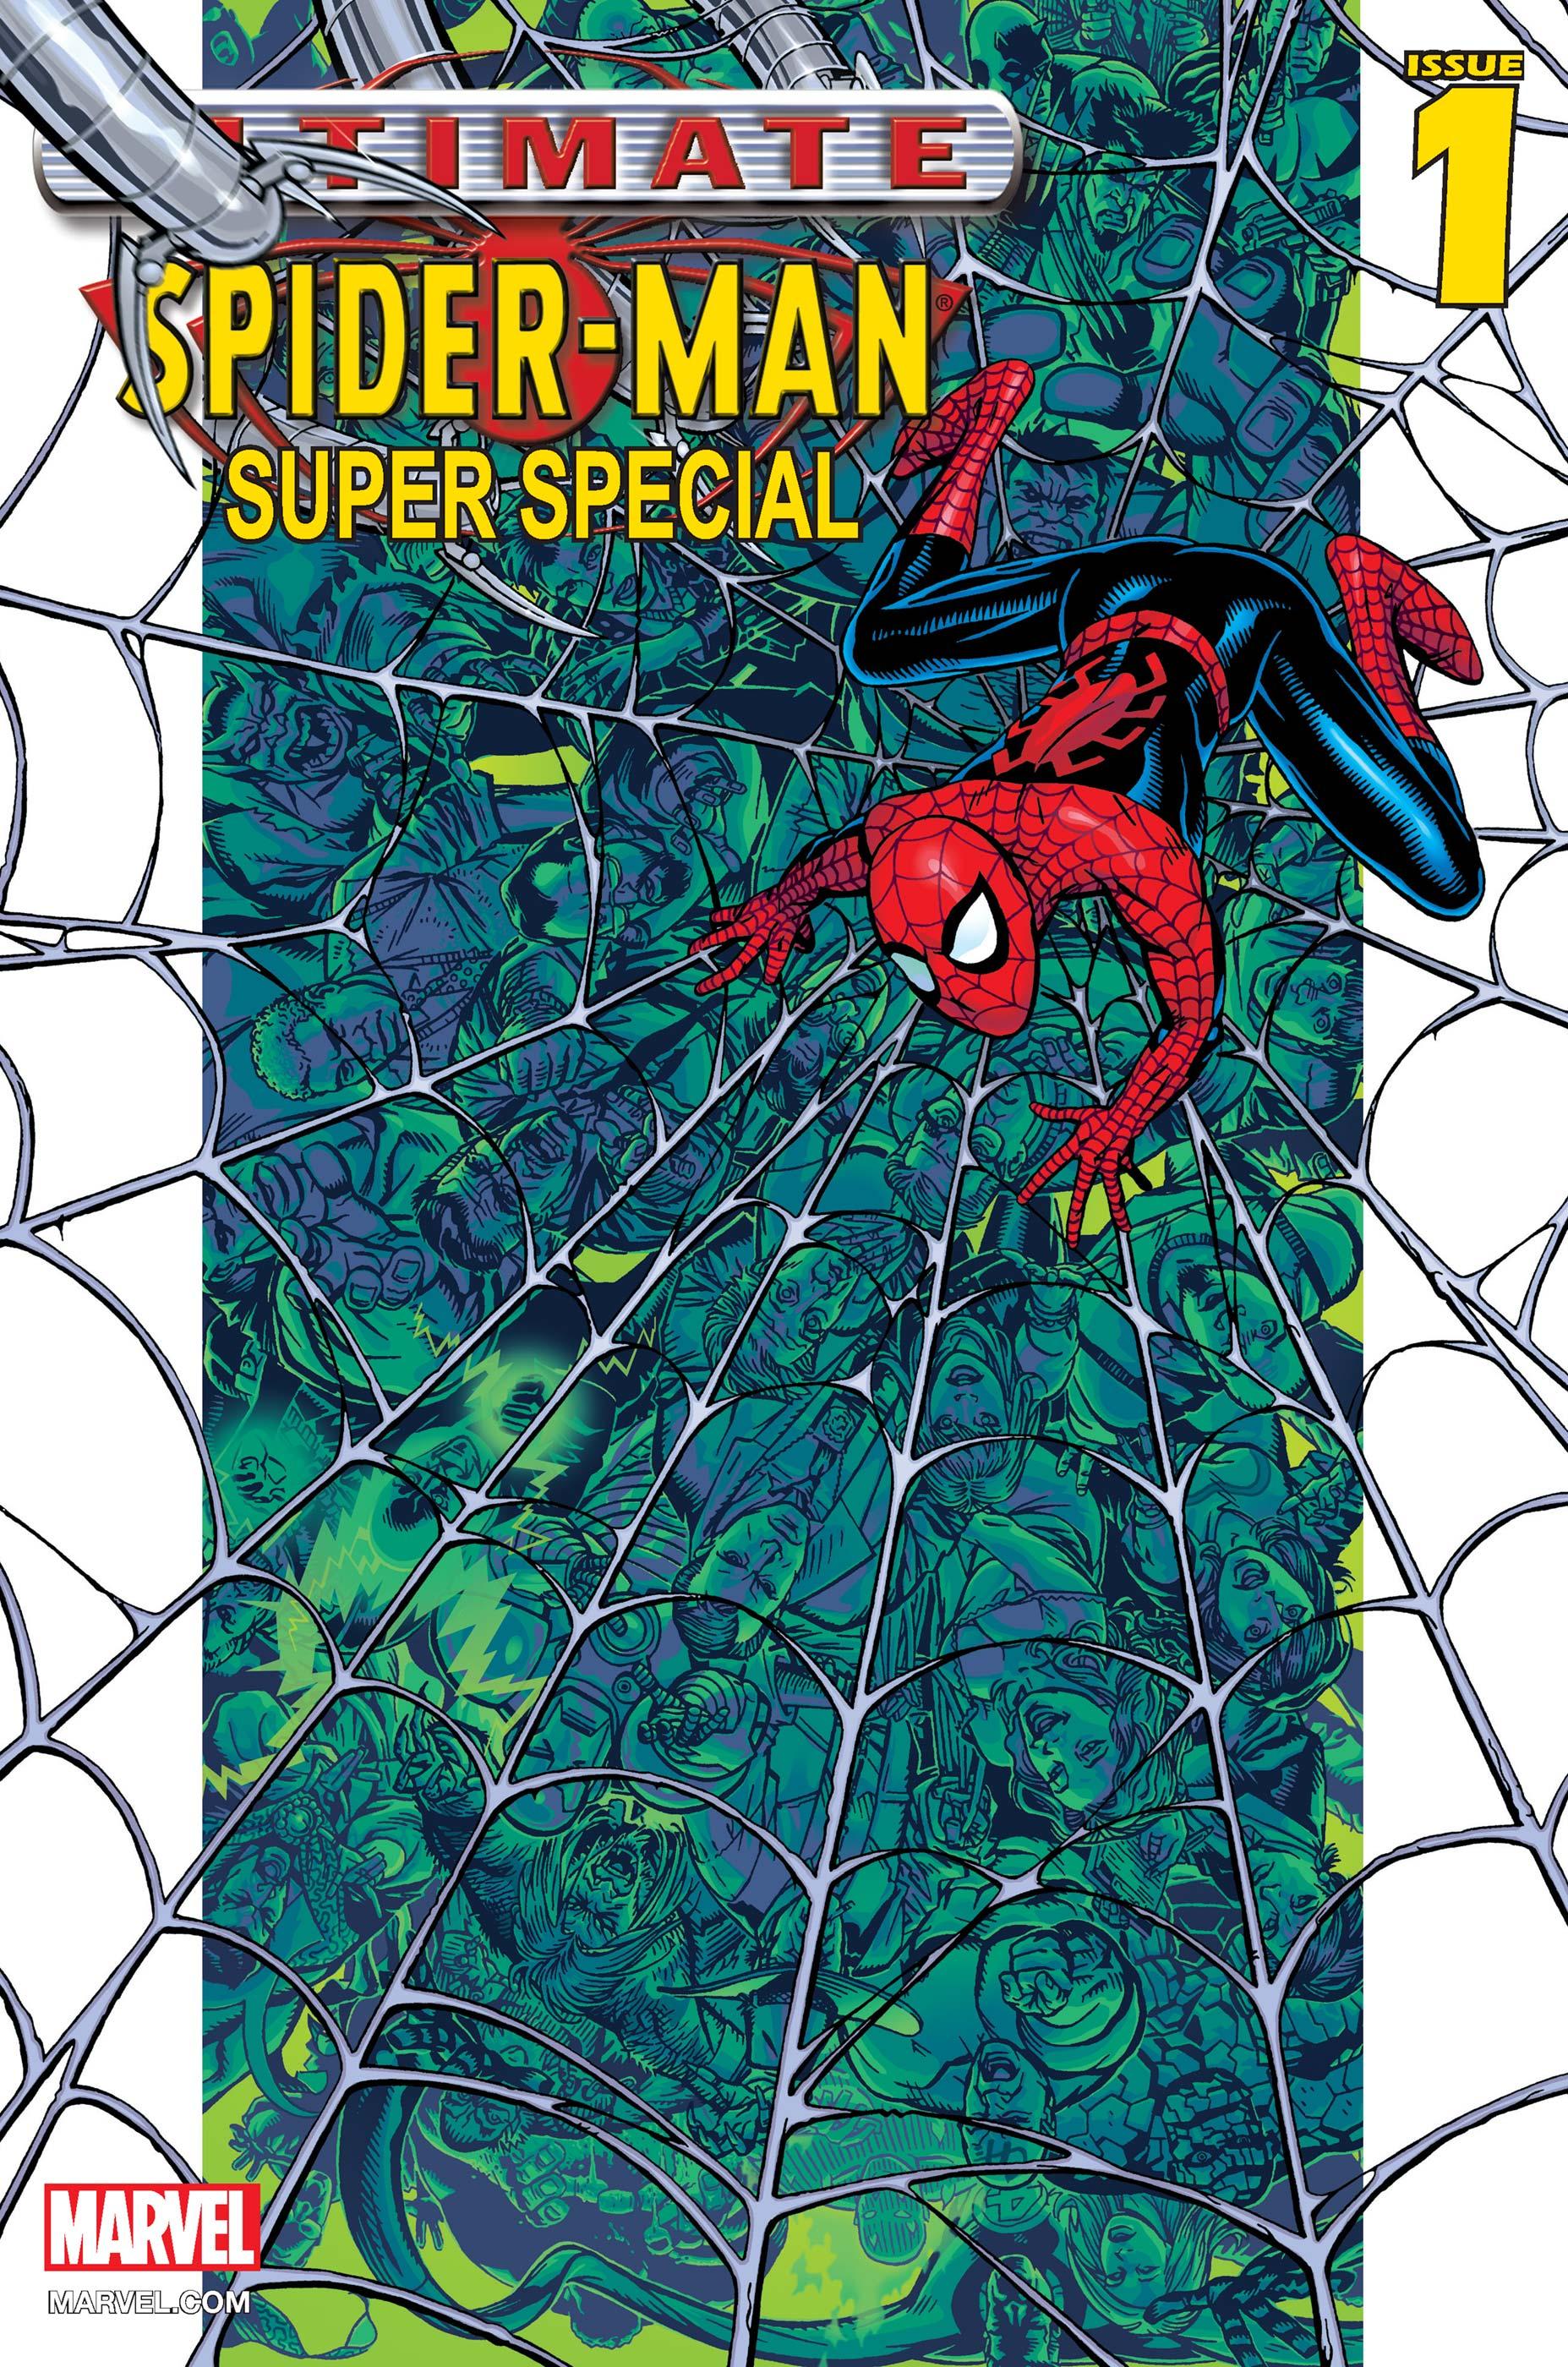 Ultimate Spider-Man Super Special (2002) #1